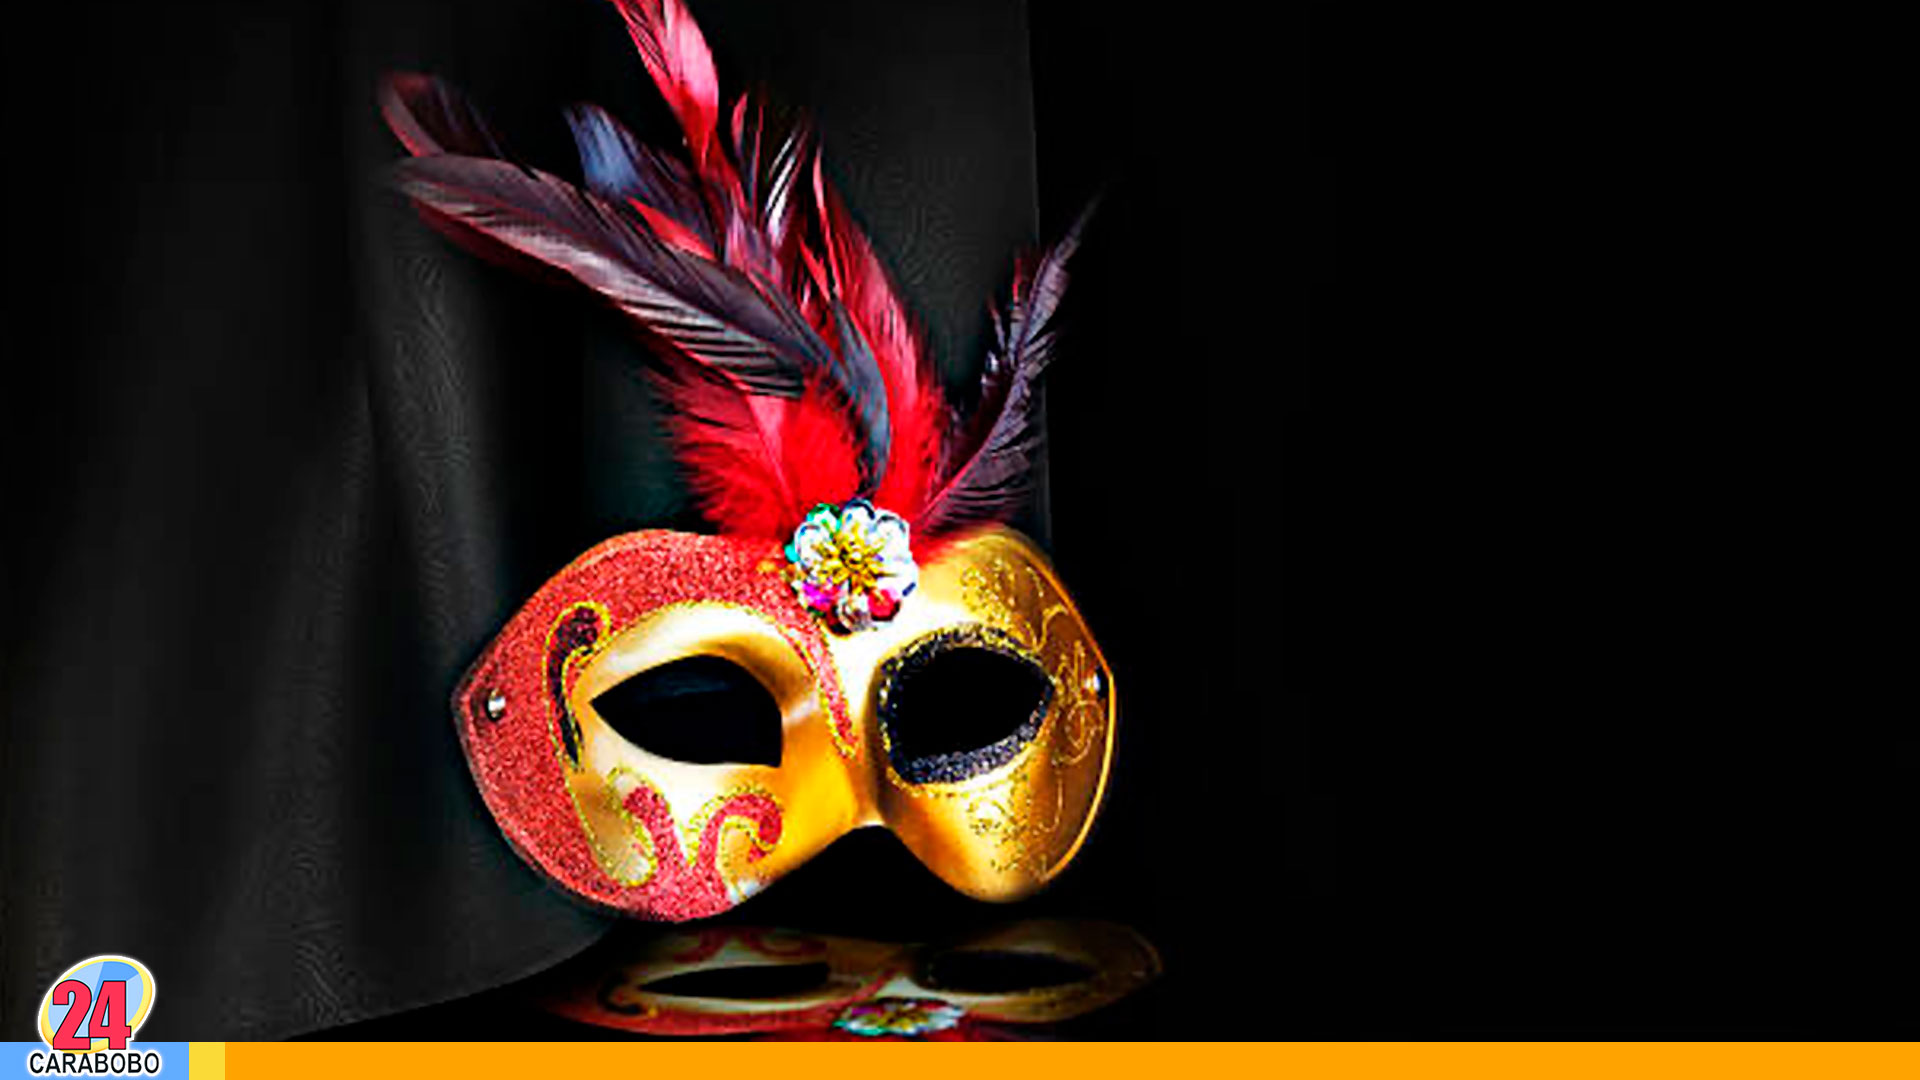 Temporada de Carnaval-noticias 24 carabobo